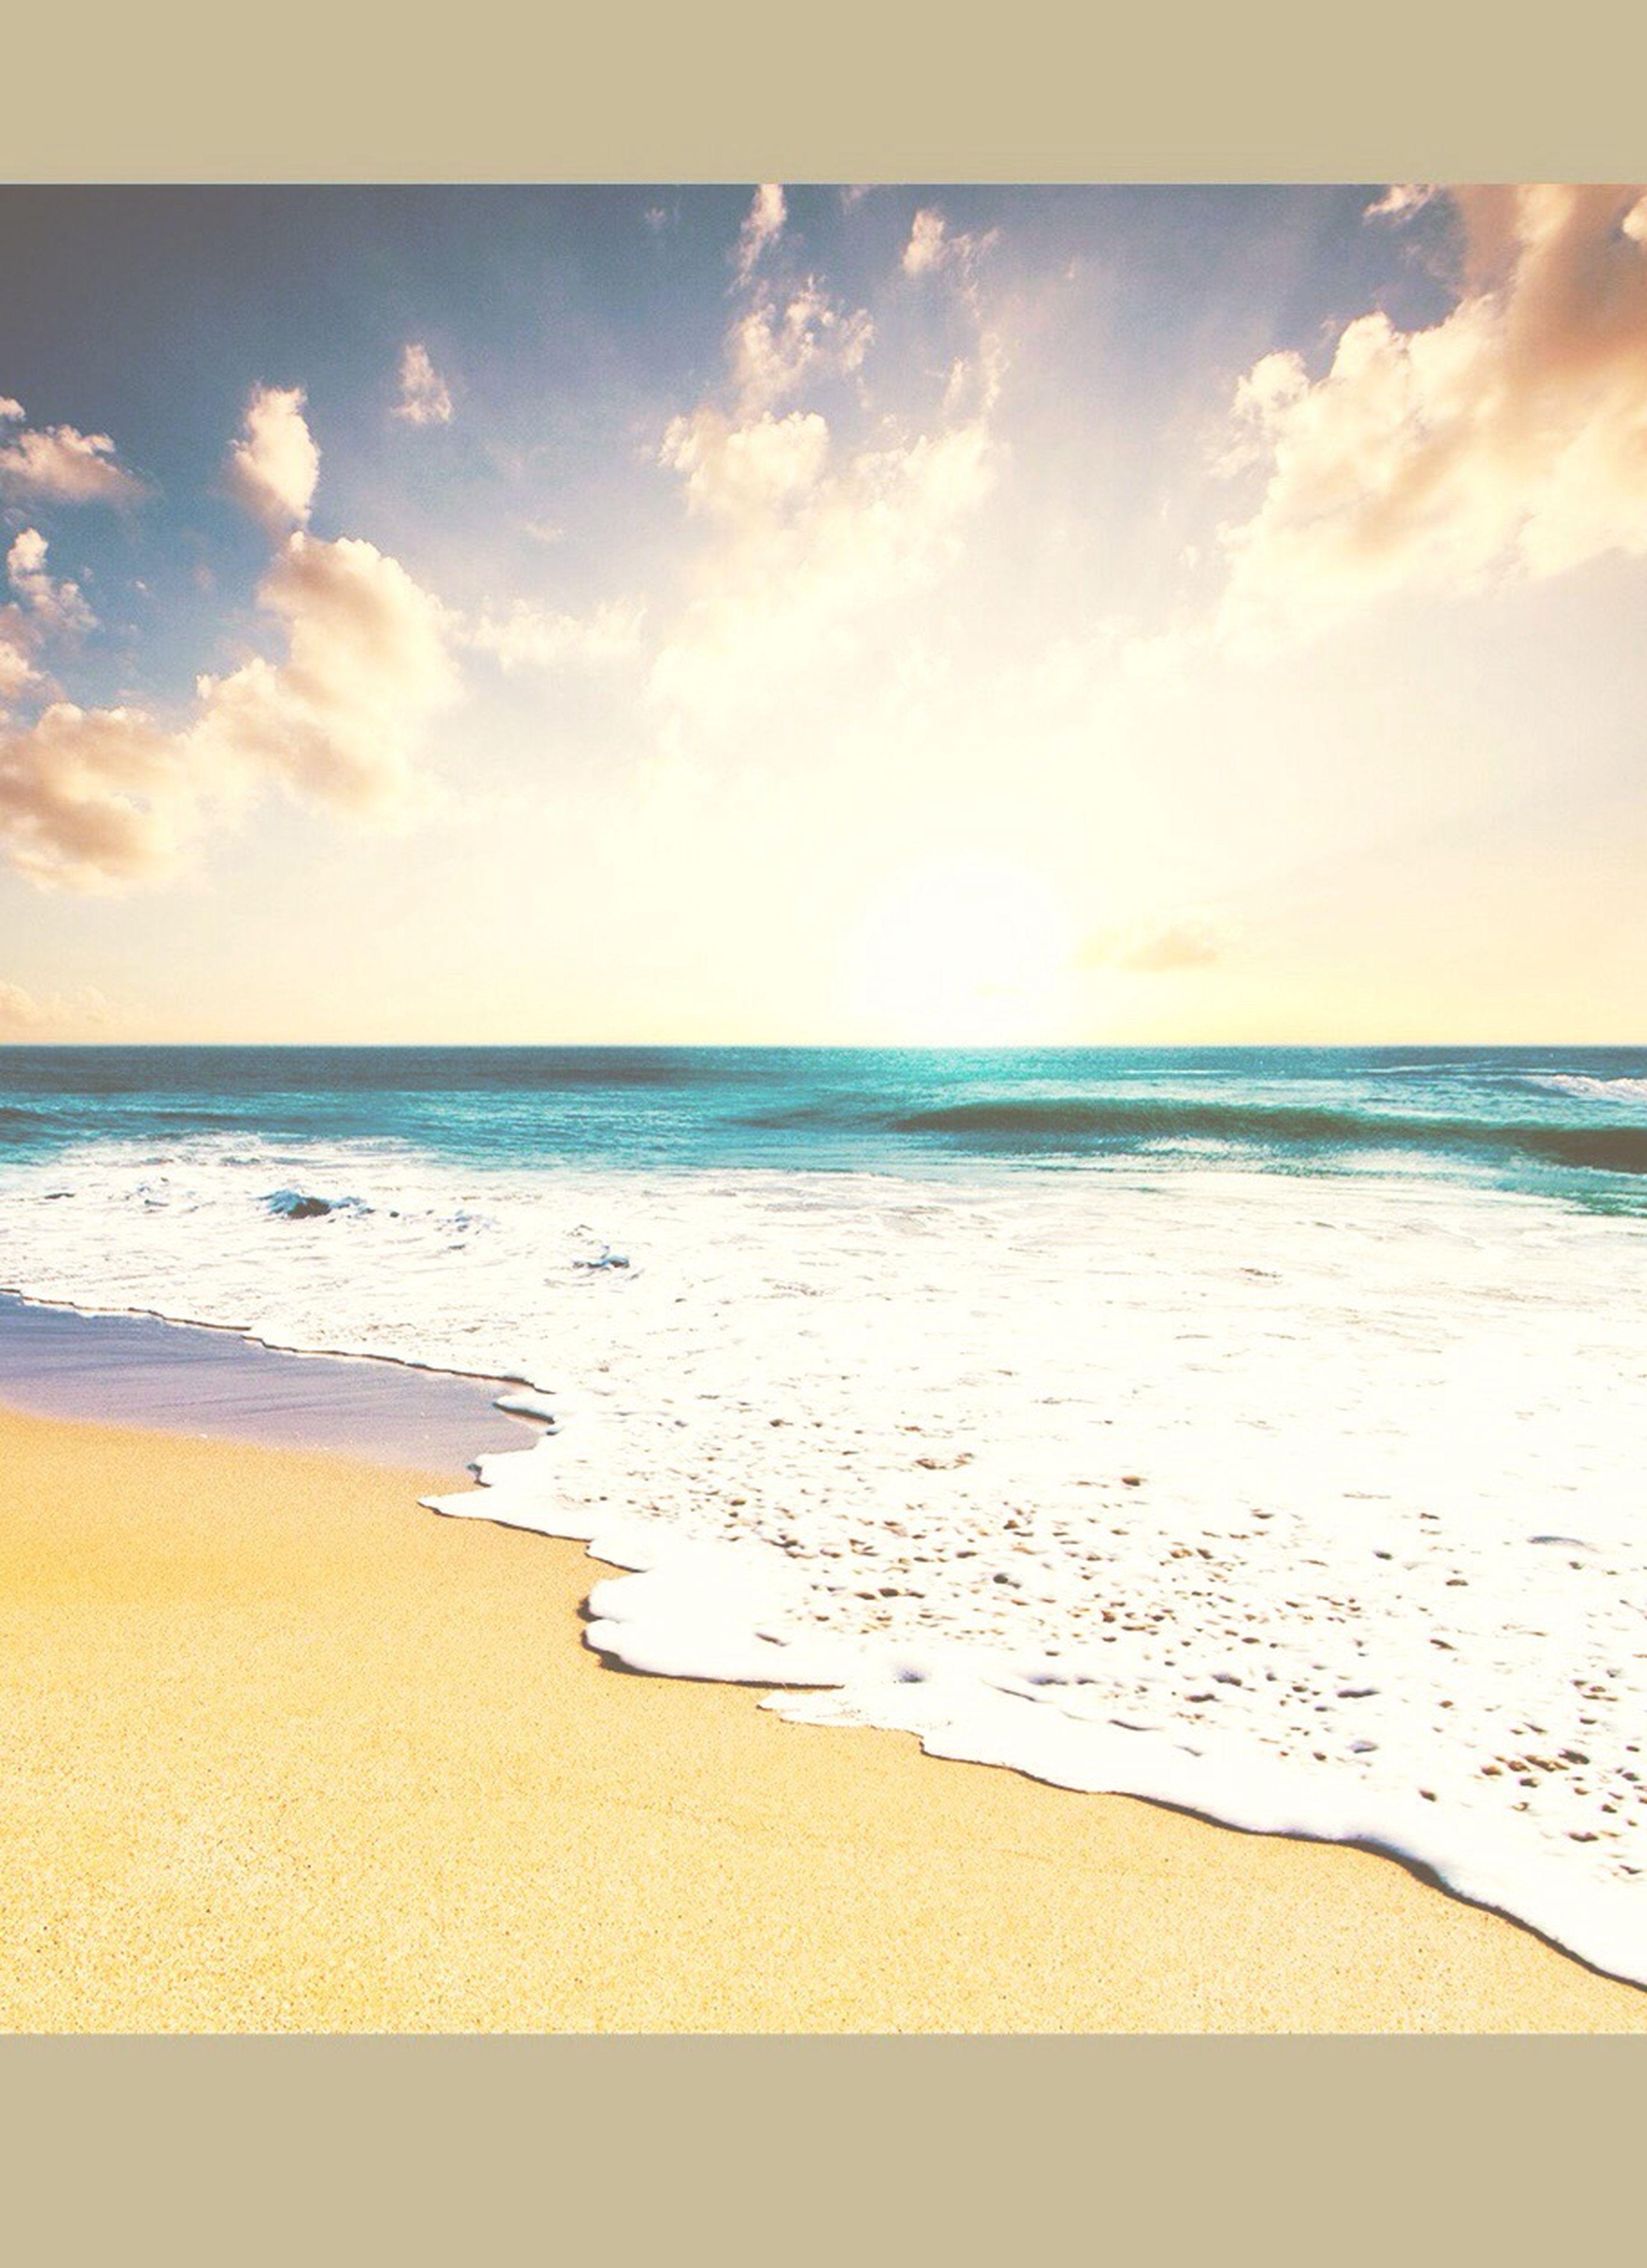 sea, beach, horizon over water, water, shore, sky, sand, scenics, tranquil scene, beauty in nature, tranquility, nature, bird, cloud - sky, idyllic, cloud, outdoors, sunset, seagull, coastline